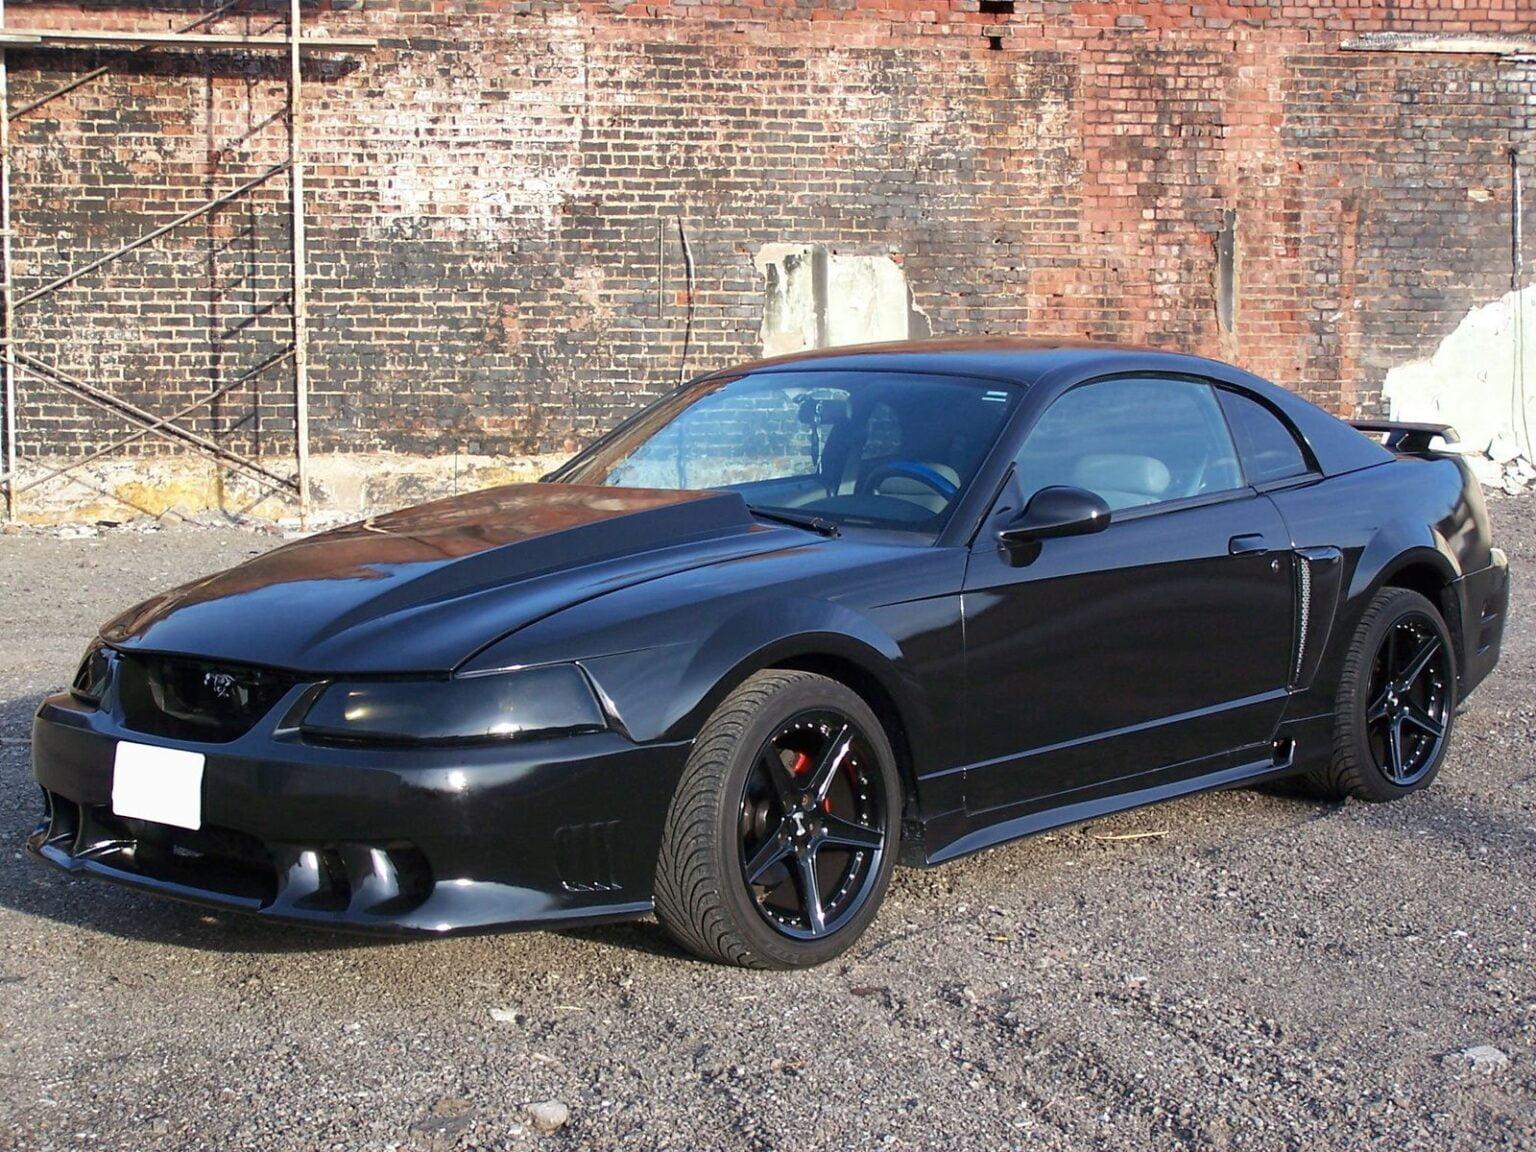 Mustang2000